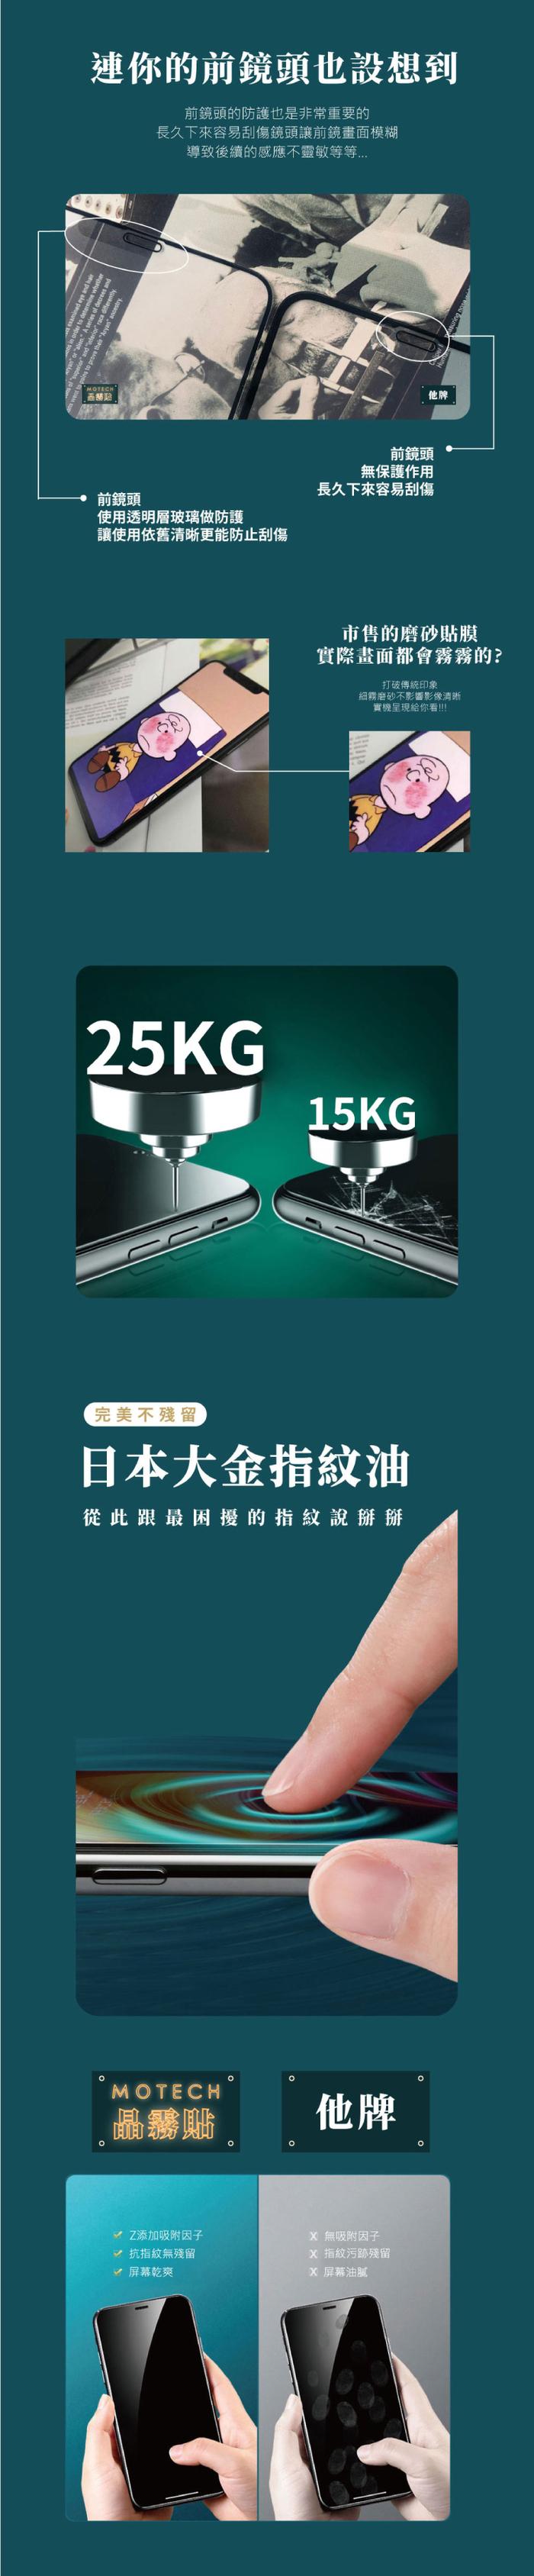 MOTECH|【獨家專利】 晶霧貼 超細高透 電競專用 ROG3 保護貼